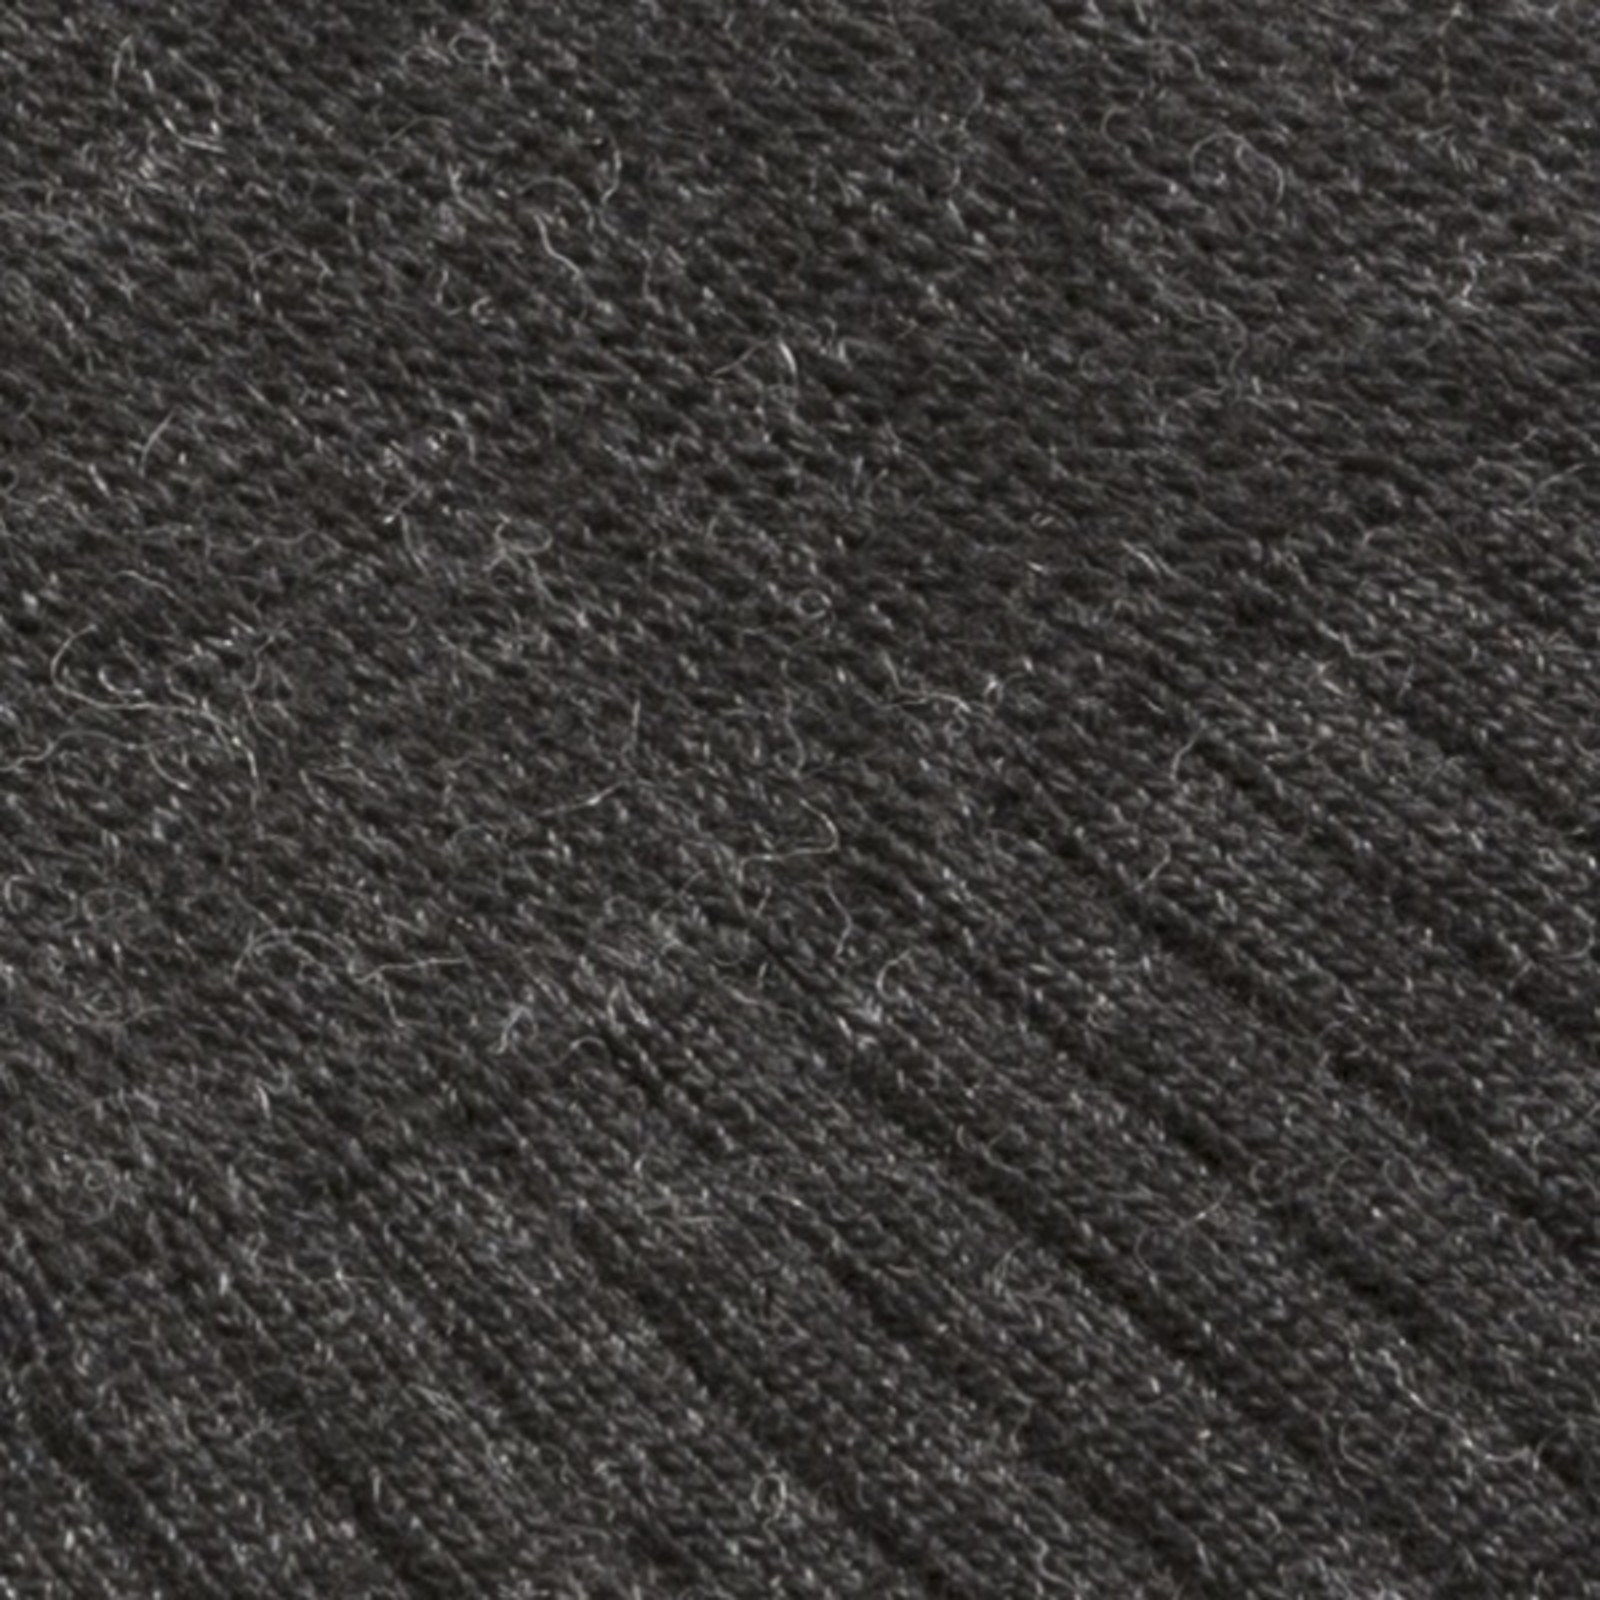 Carlo Lanza Anthrazitfarbenen Merino Wolle Socken